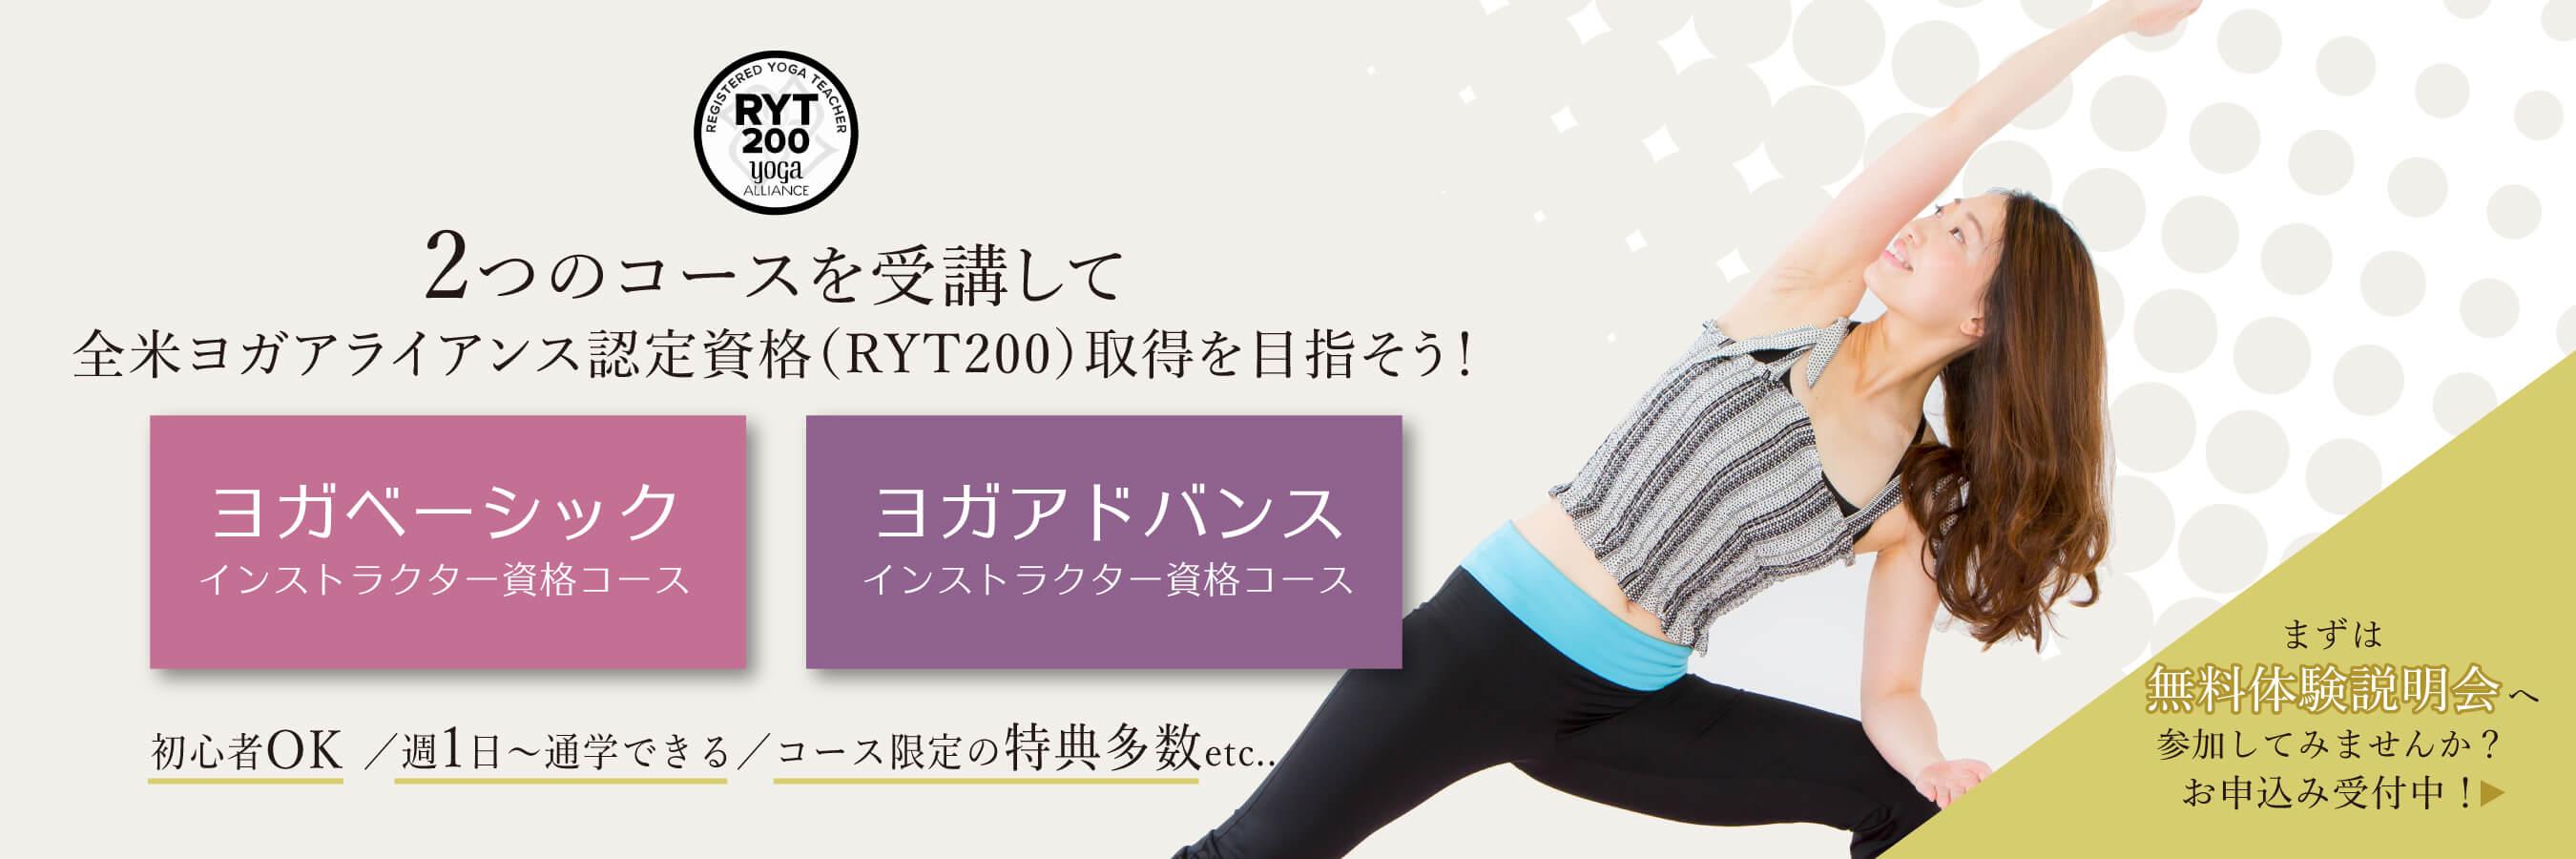 topbanner_yoga_210520_pc